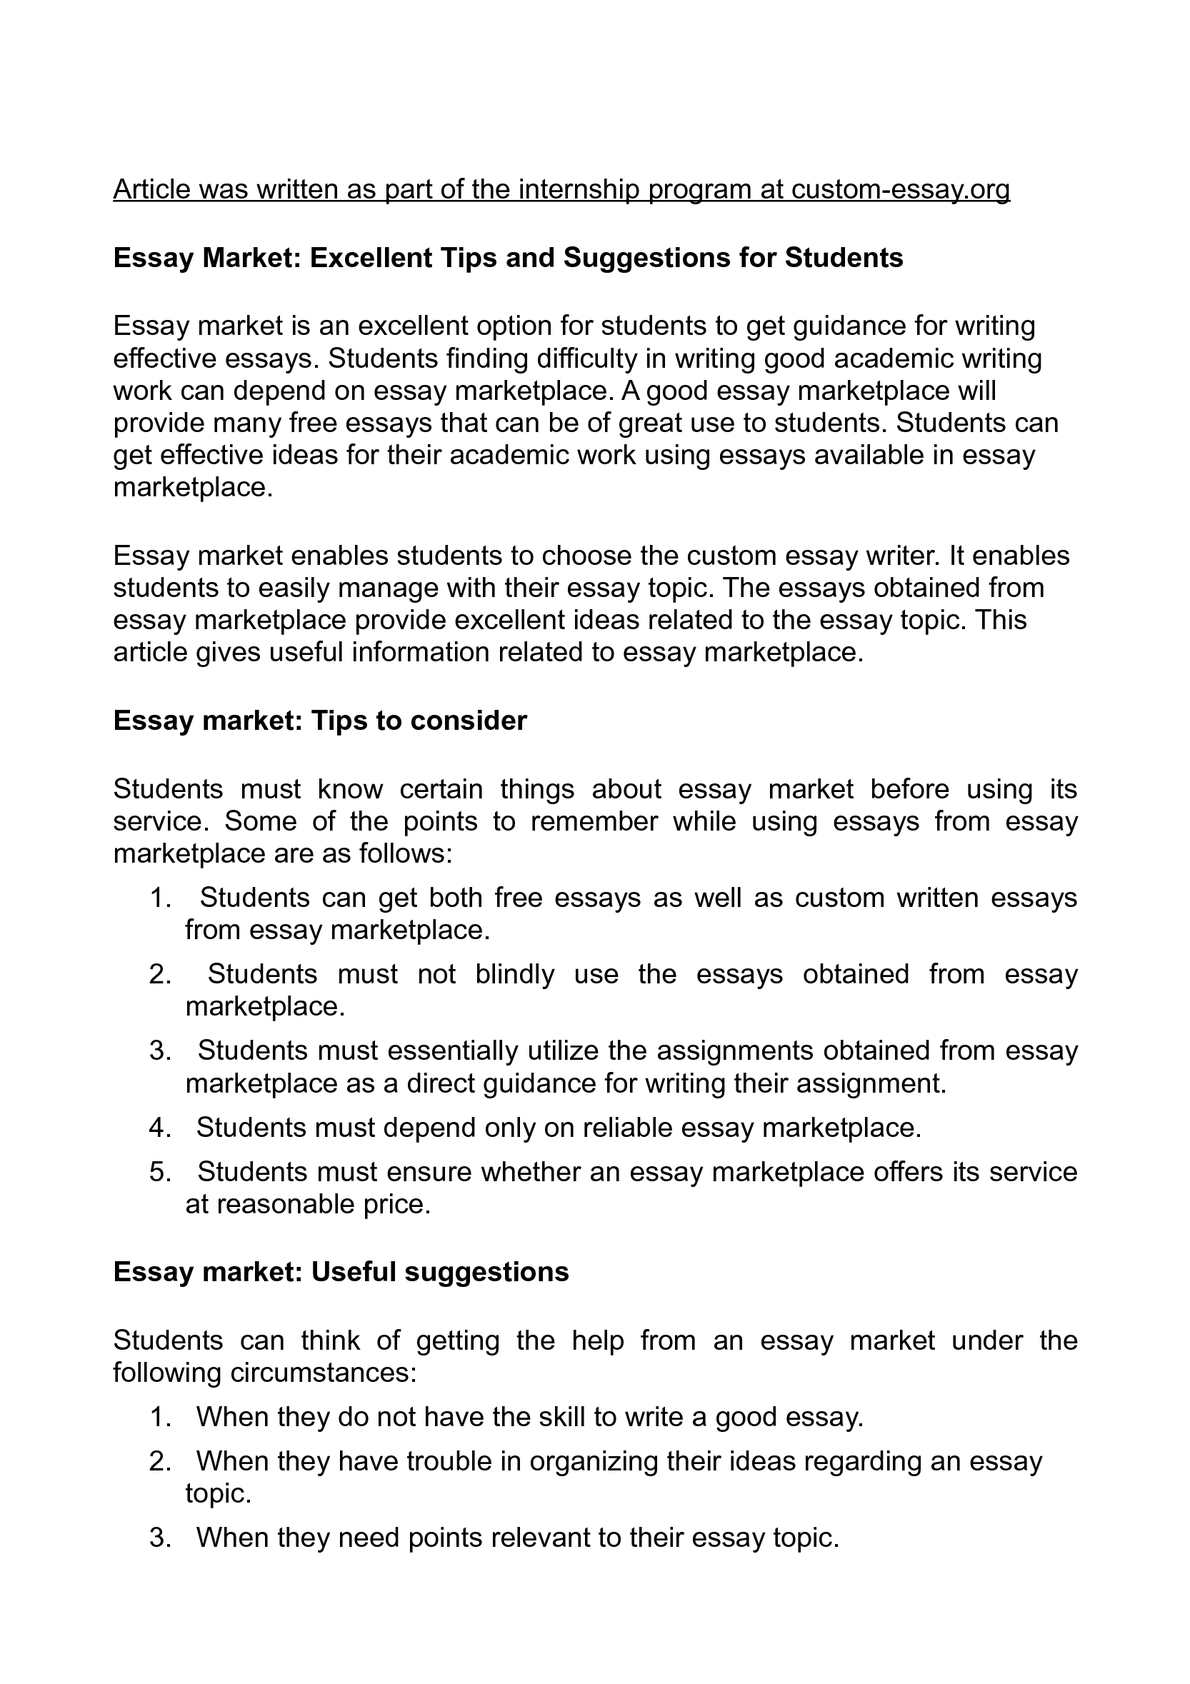 Calamo  Essay Market Excellent Tips And Suggestions For Students Essay Market Excellent Tips And Suggestions For Students